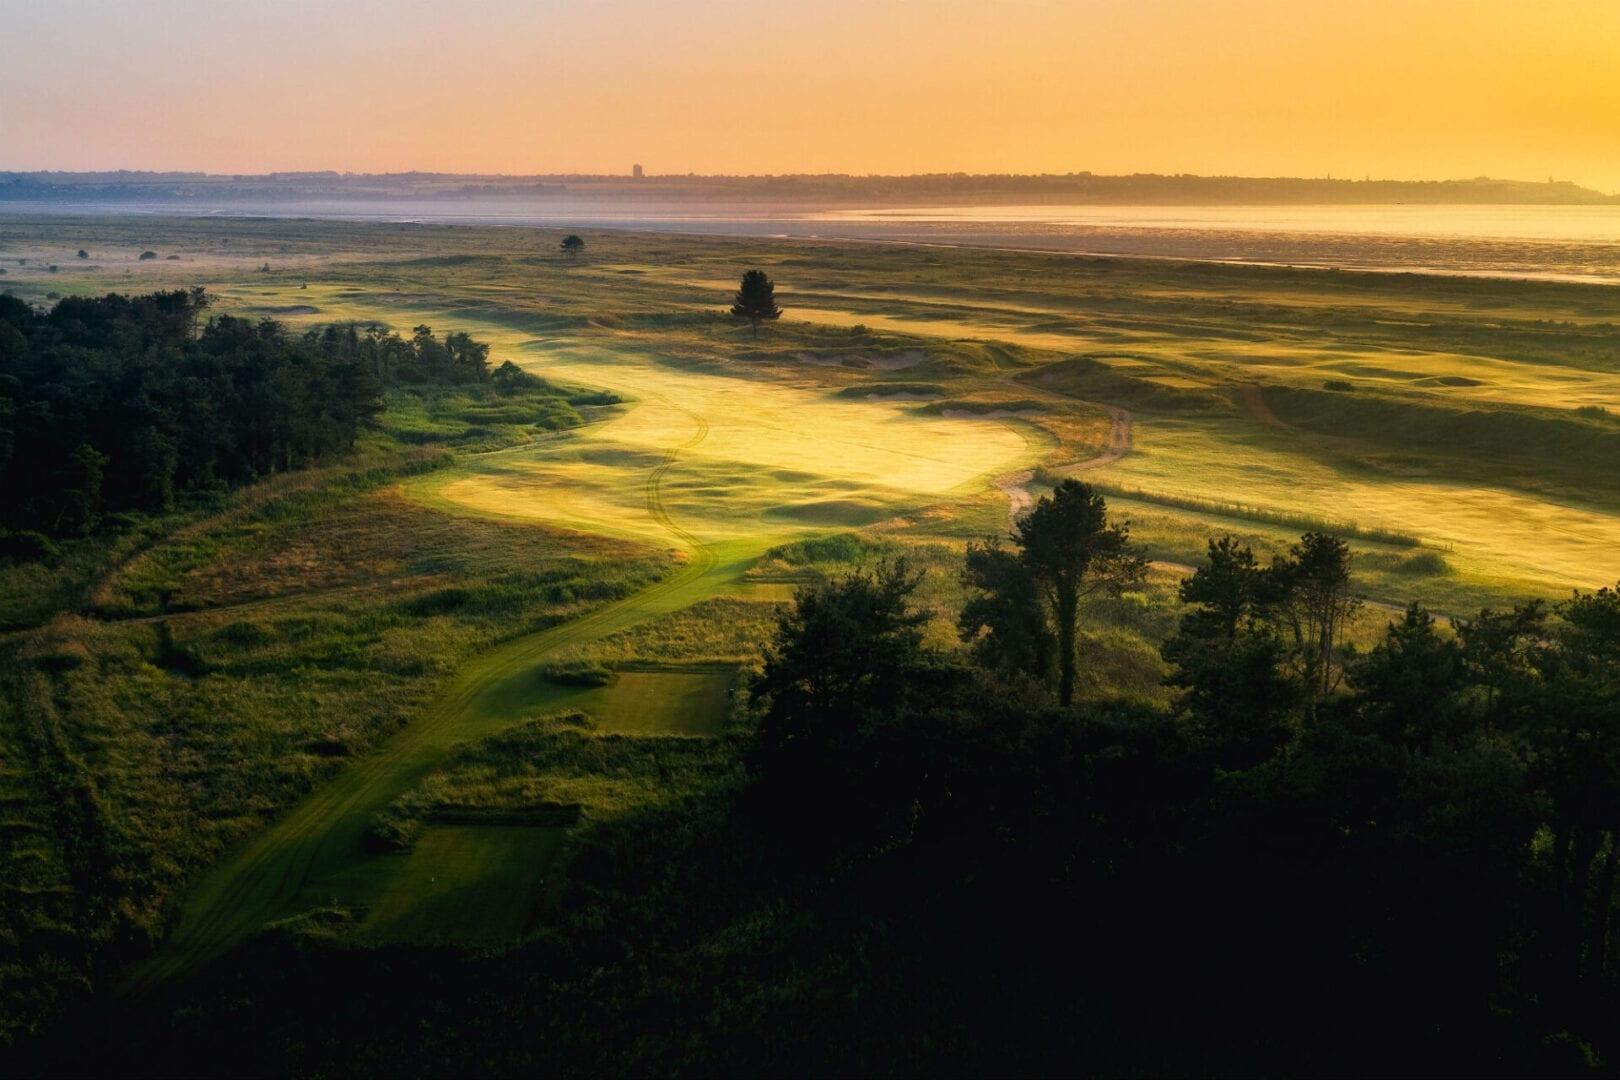 Prince's Golf Club